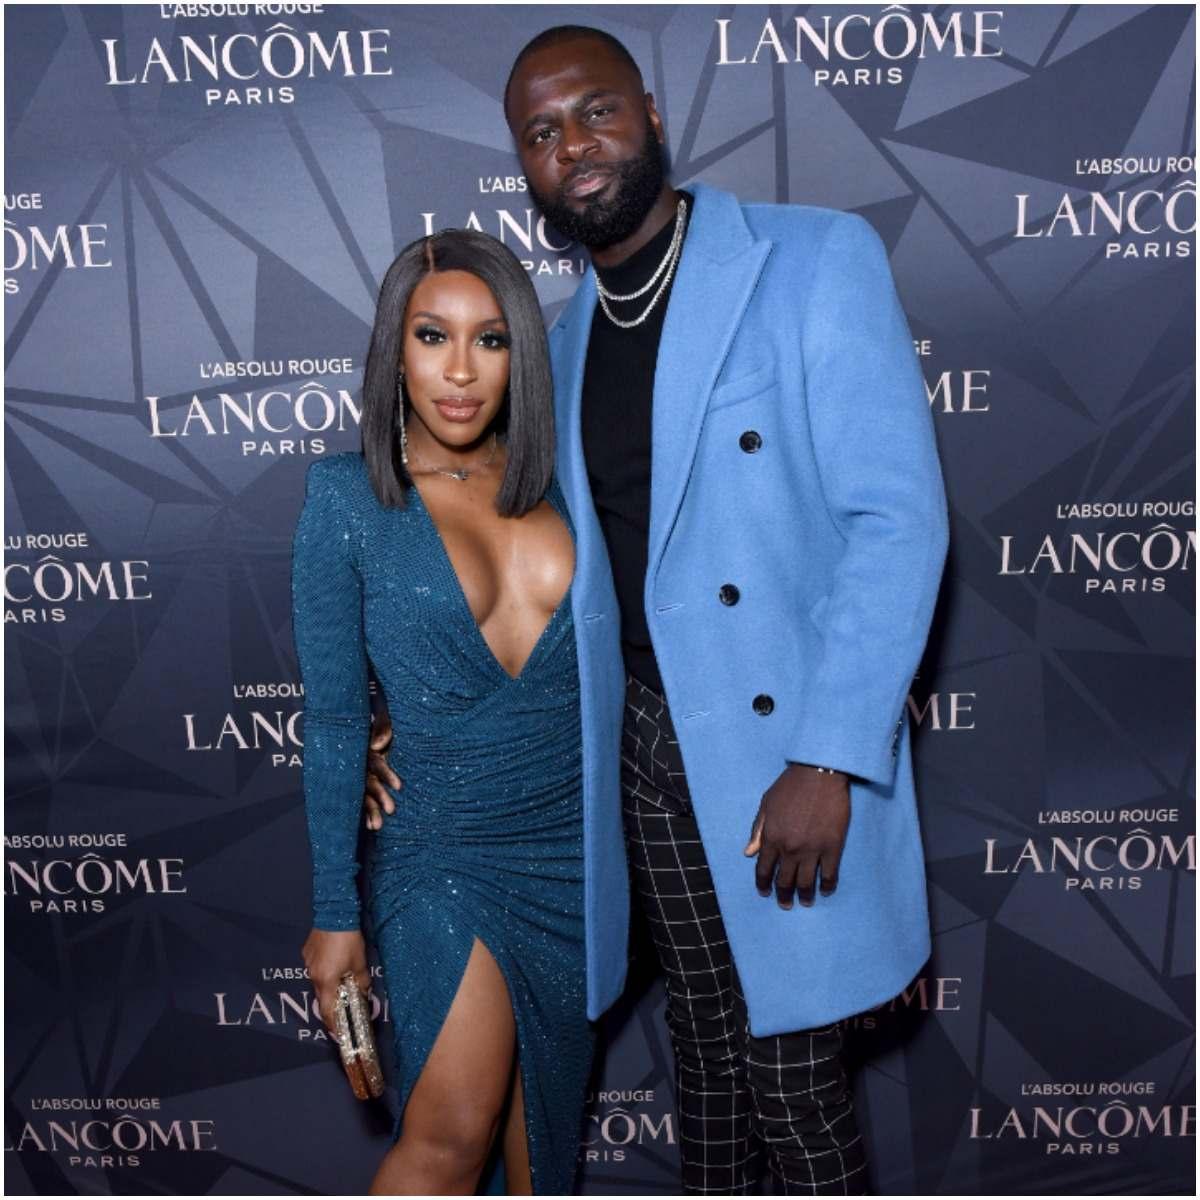 Jackie Aina with her fiancé Denis Asamoah